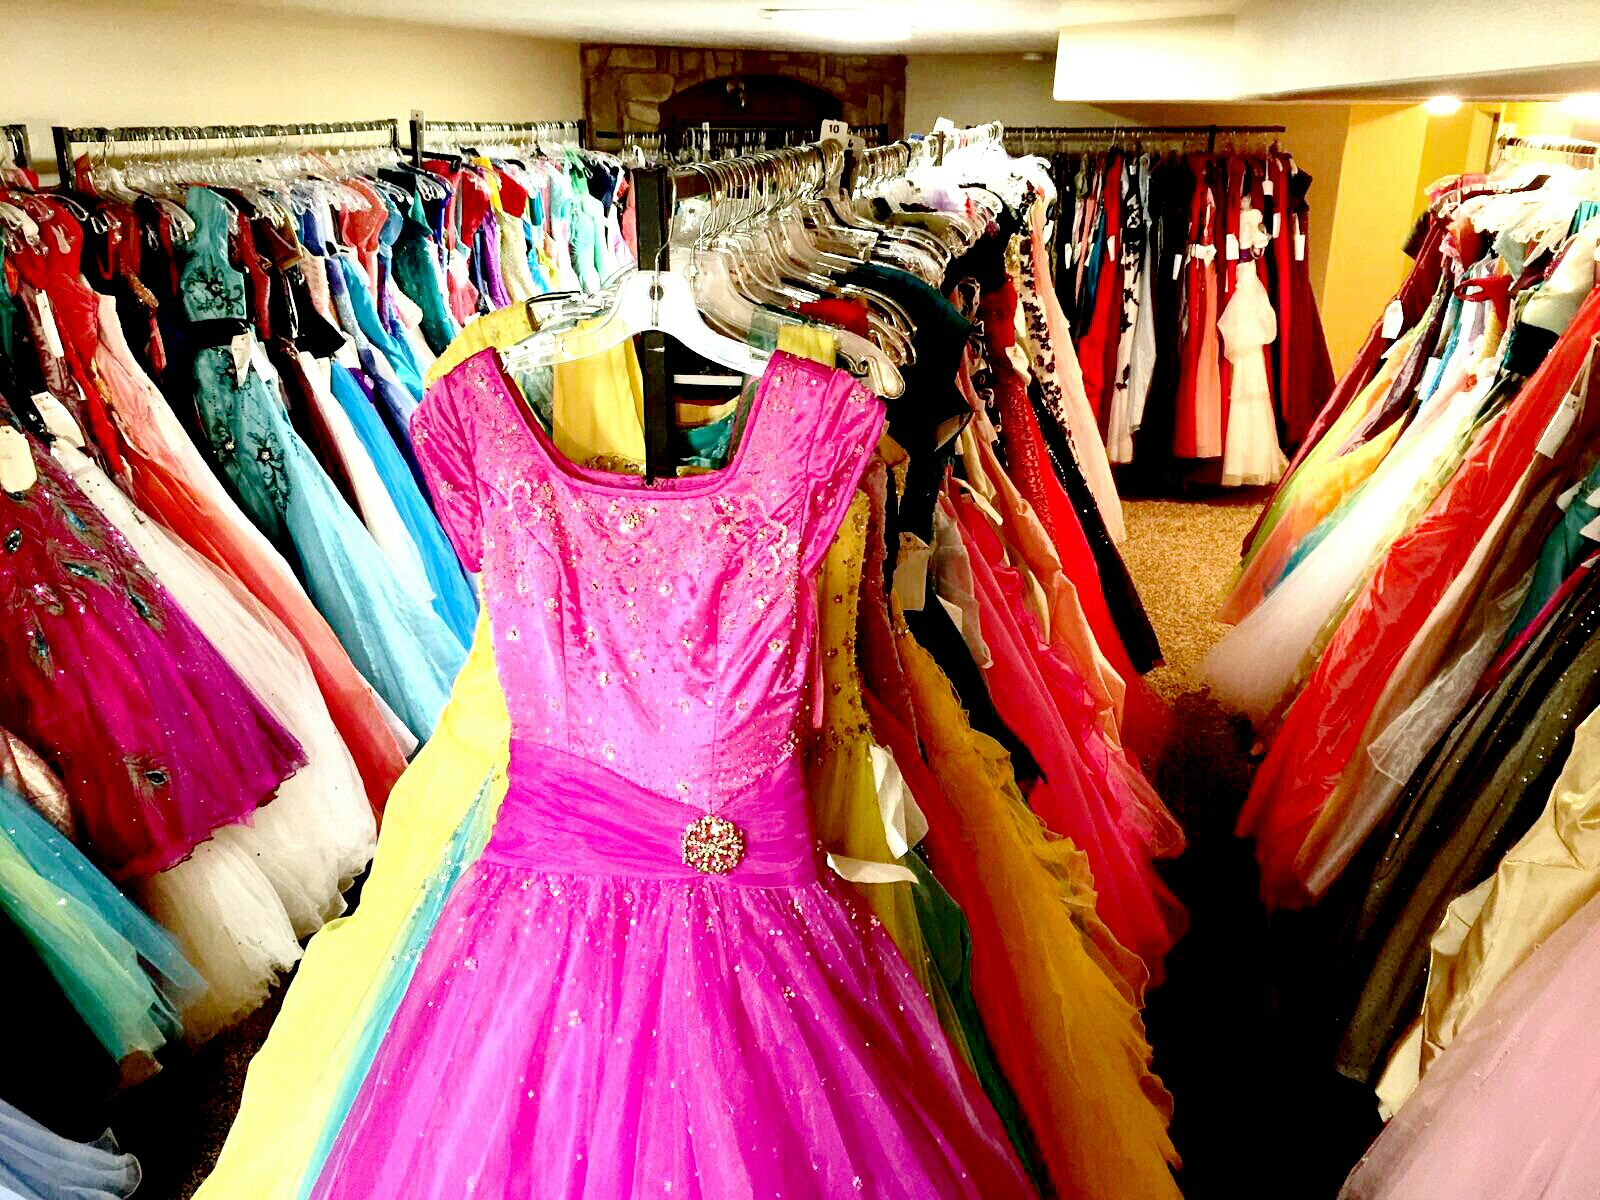 The dress garden - Dresses In Shop 4